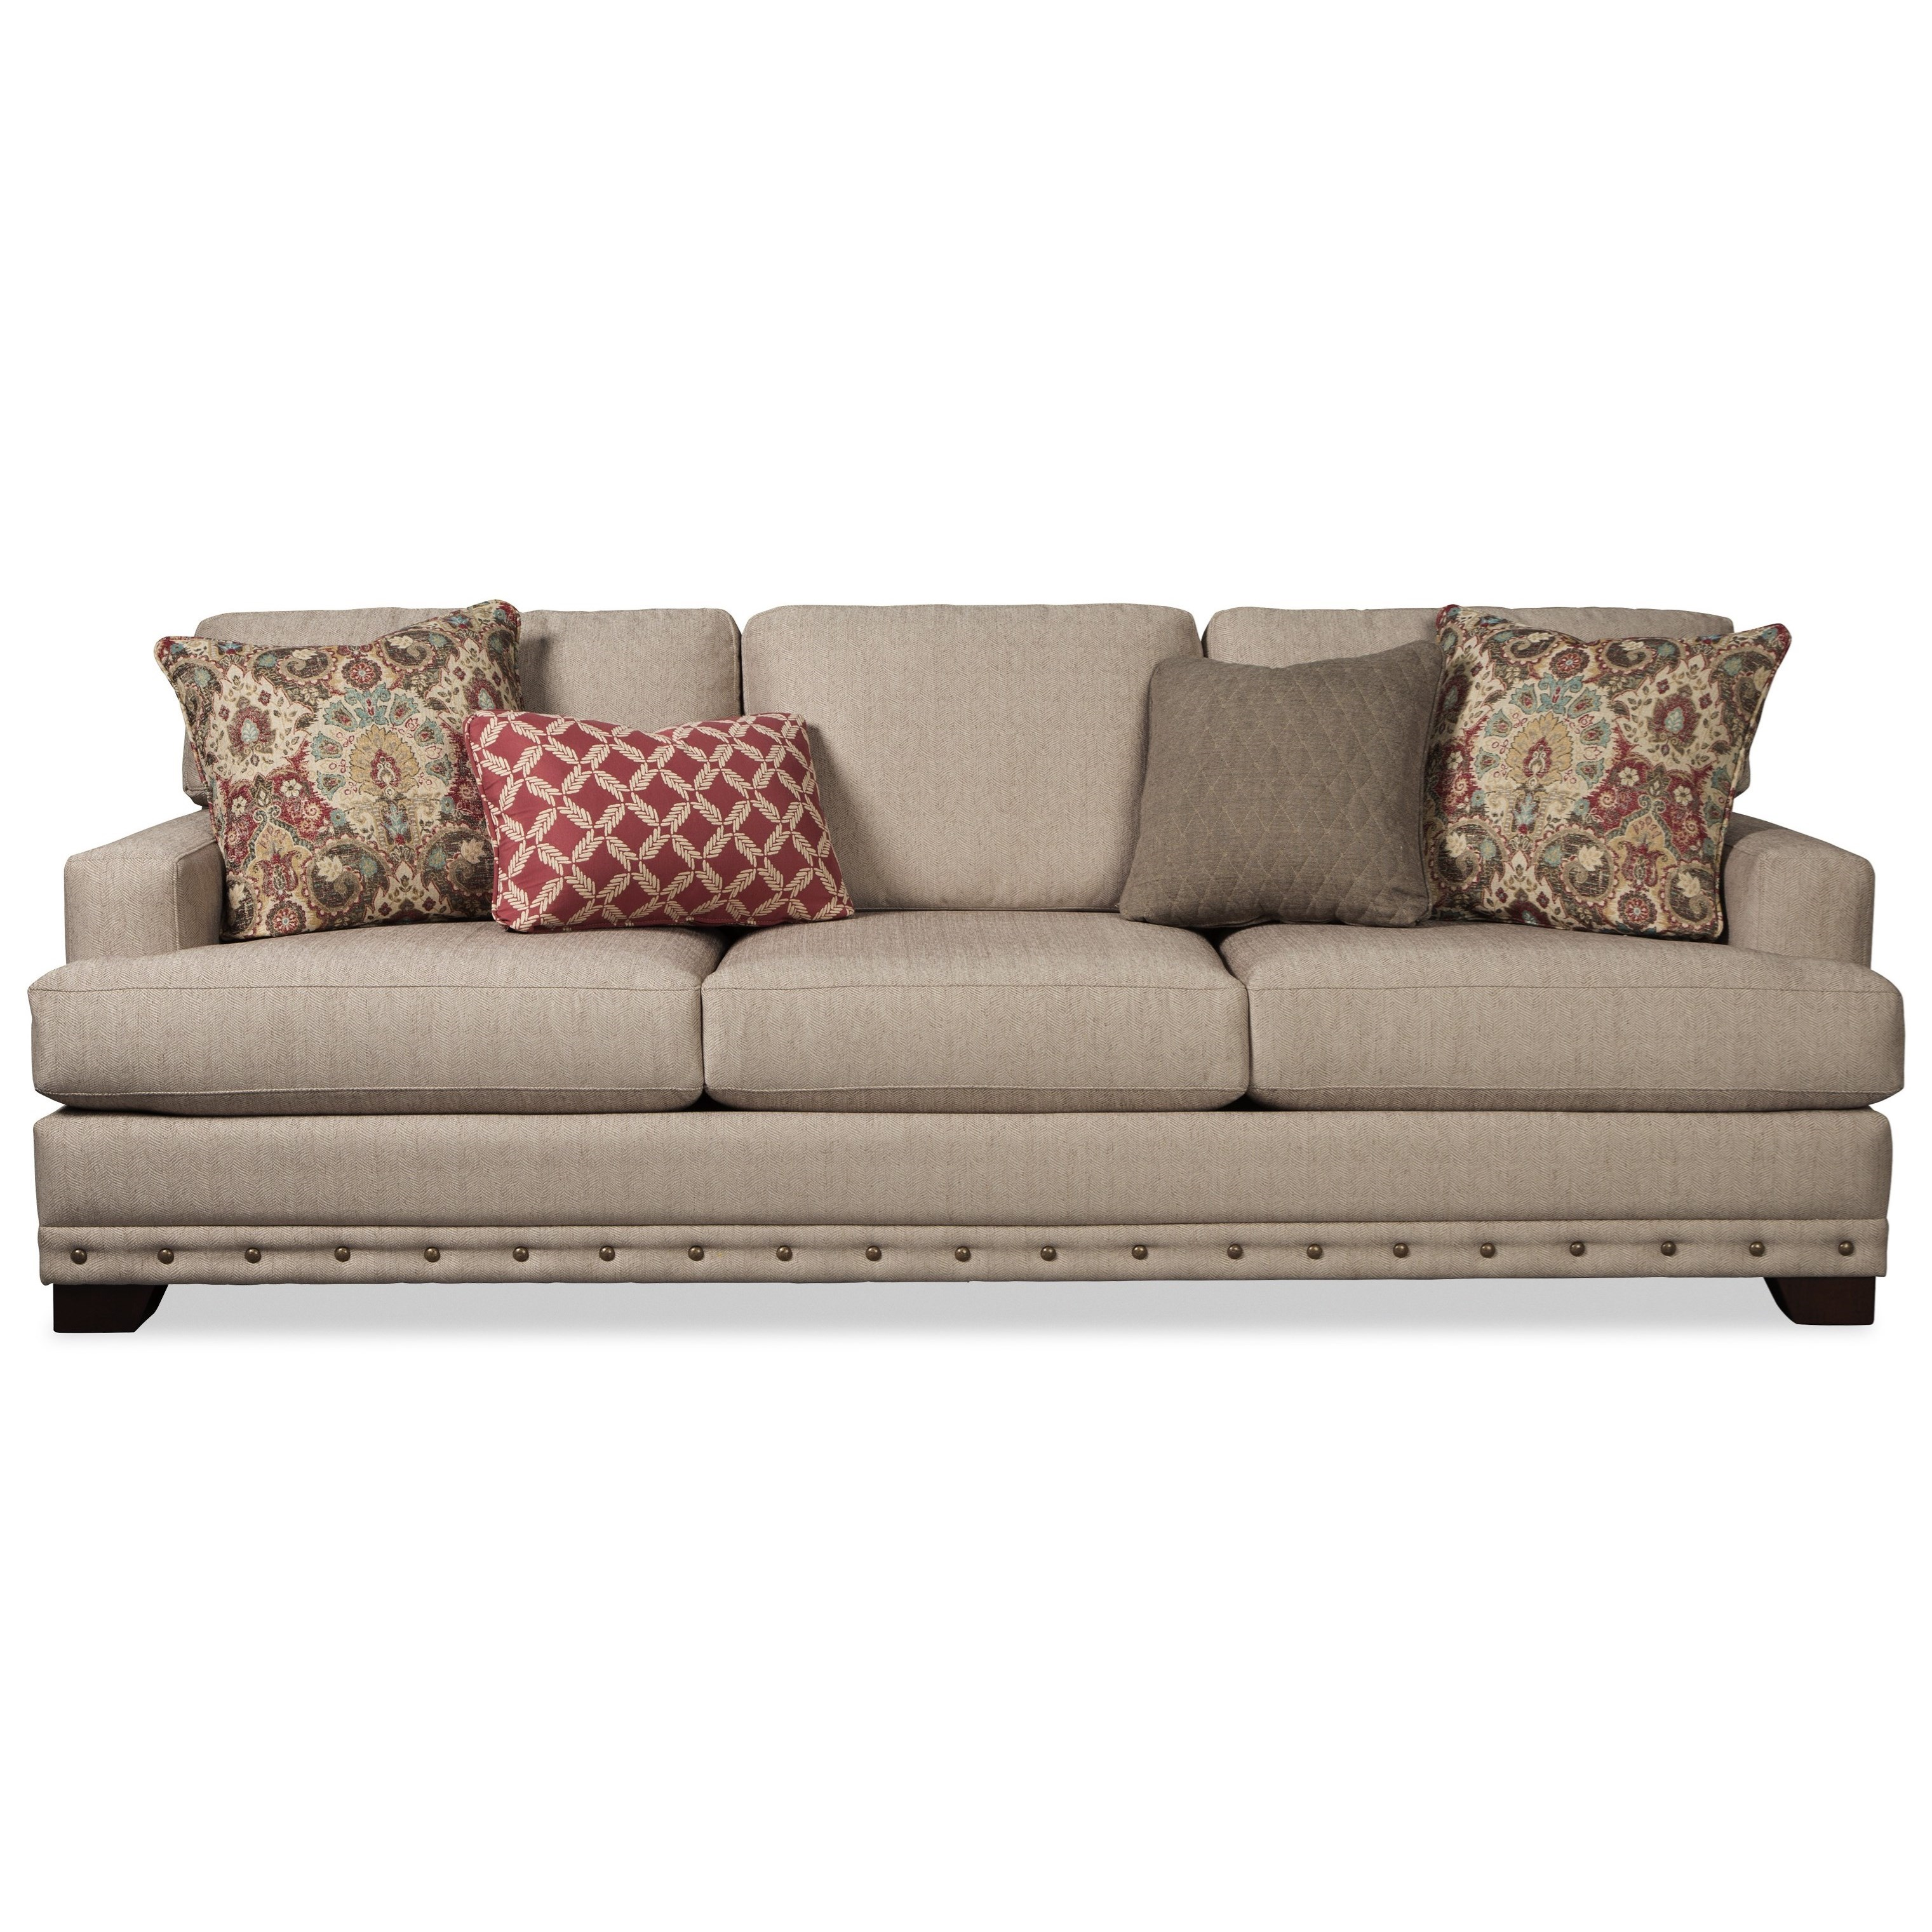 "Large 100"" Sofa With Deep Seats And Nailhead Border By"